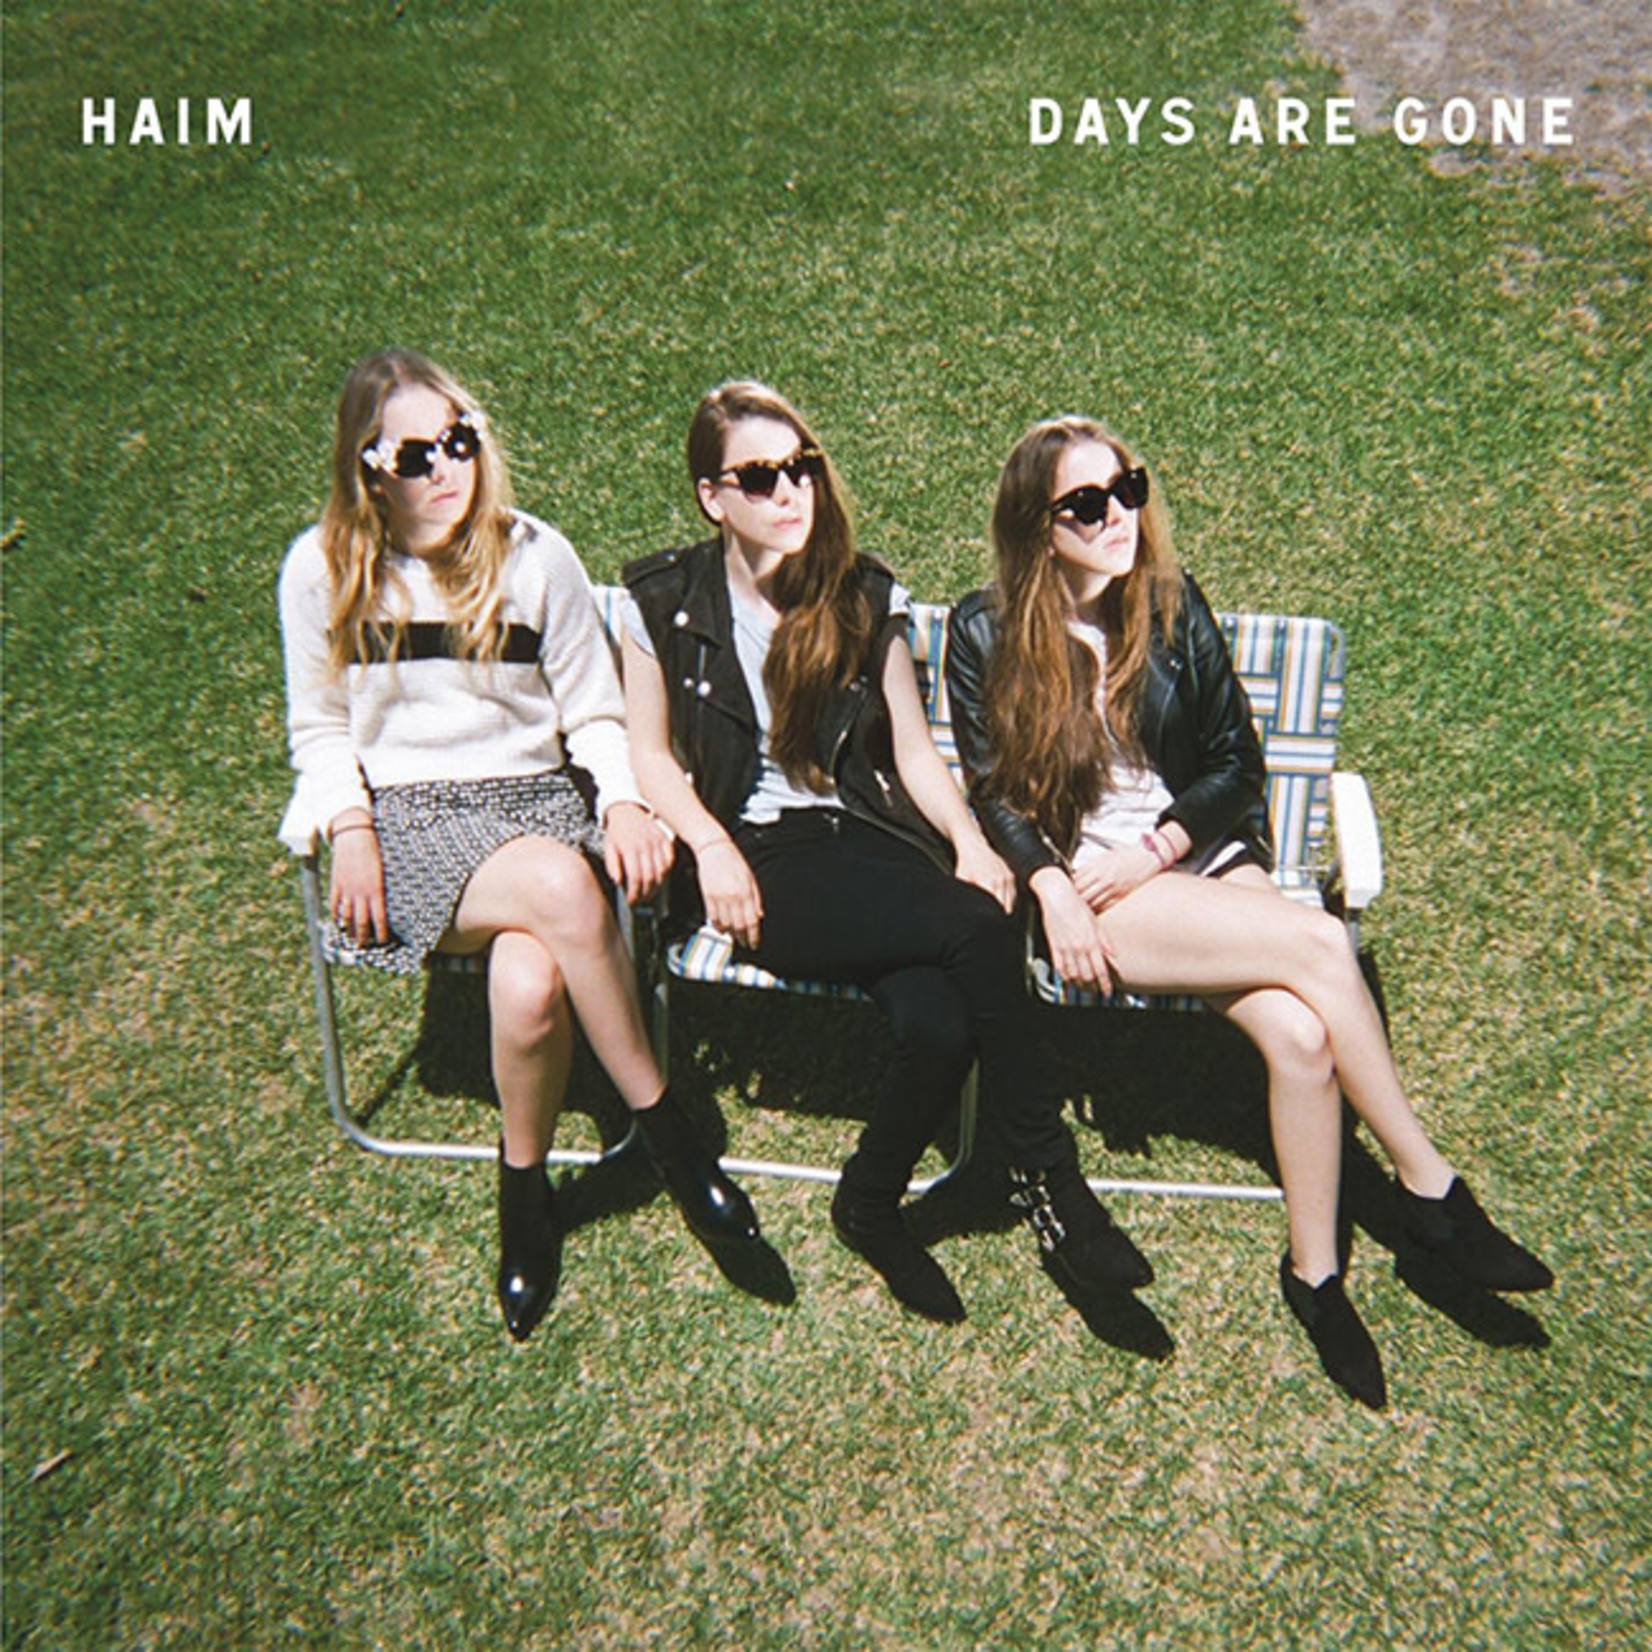 [New] Haim: Days Are Gone